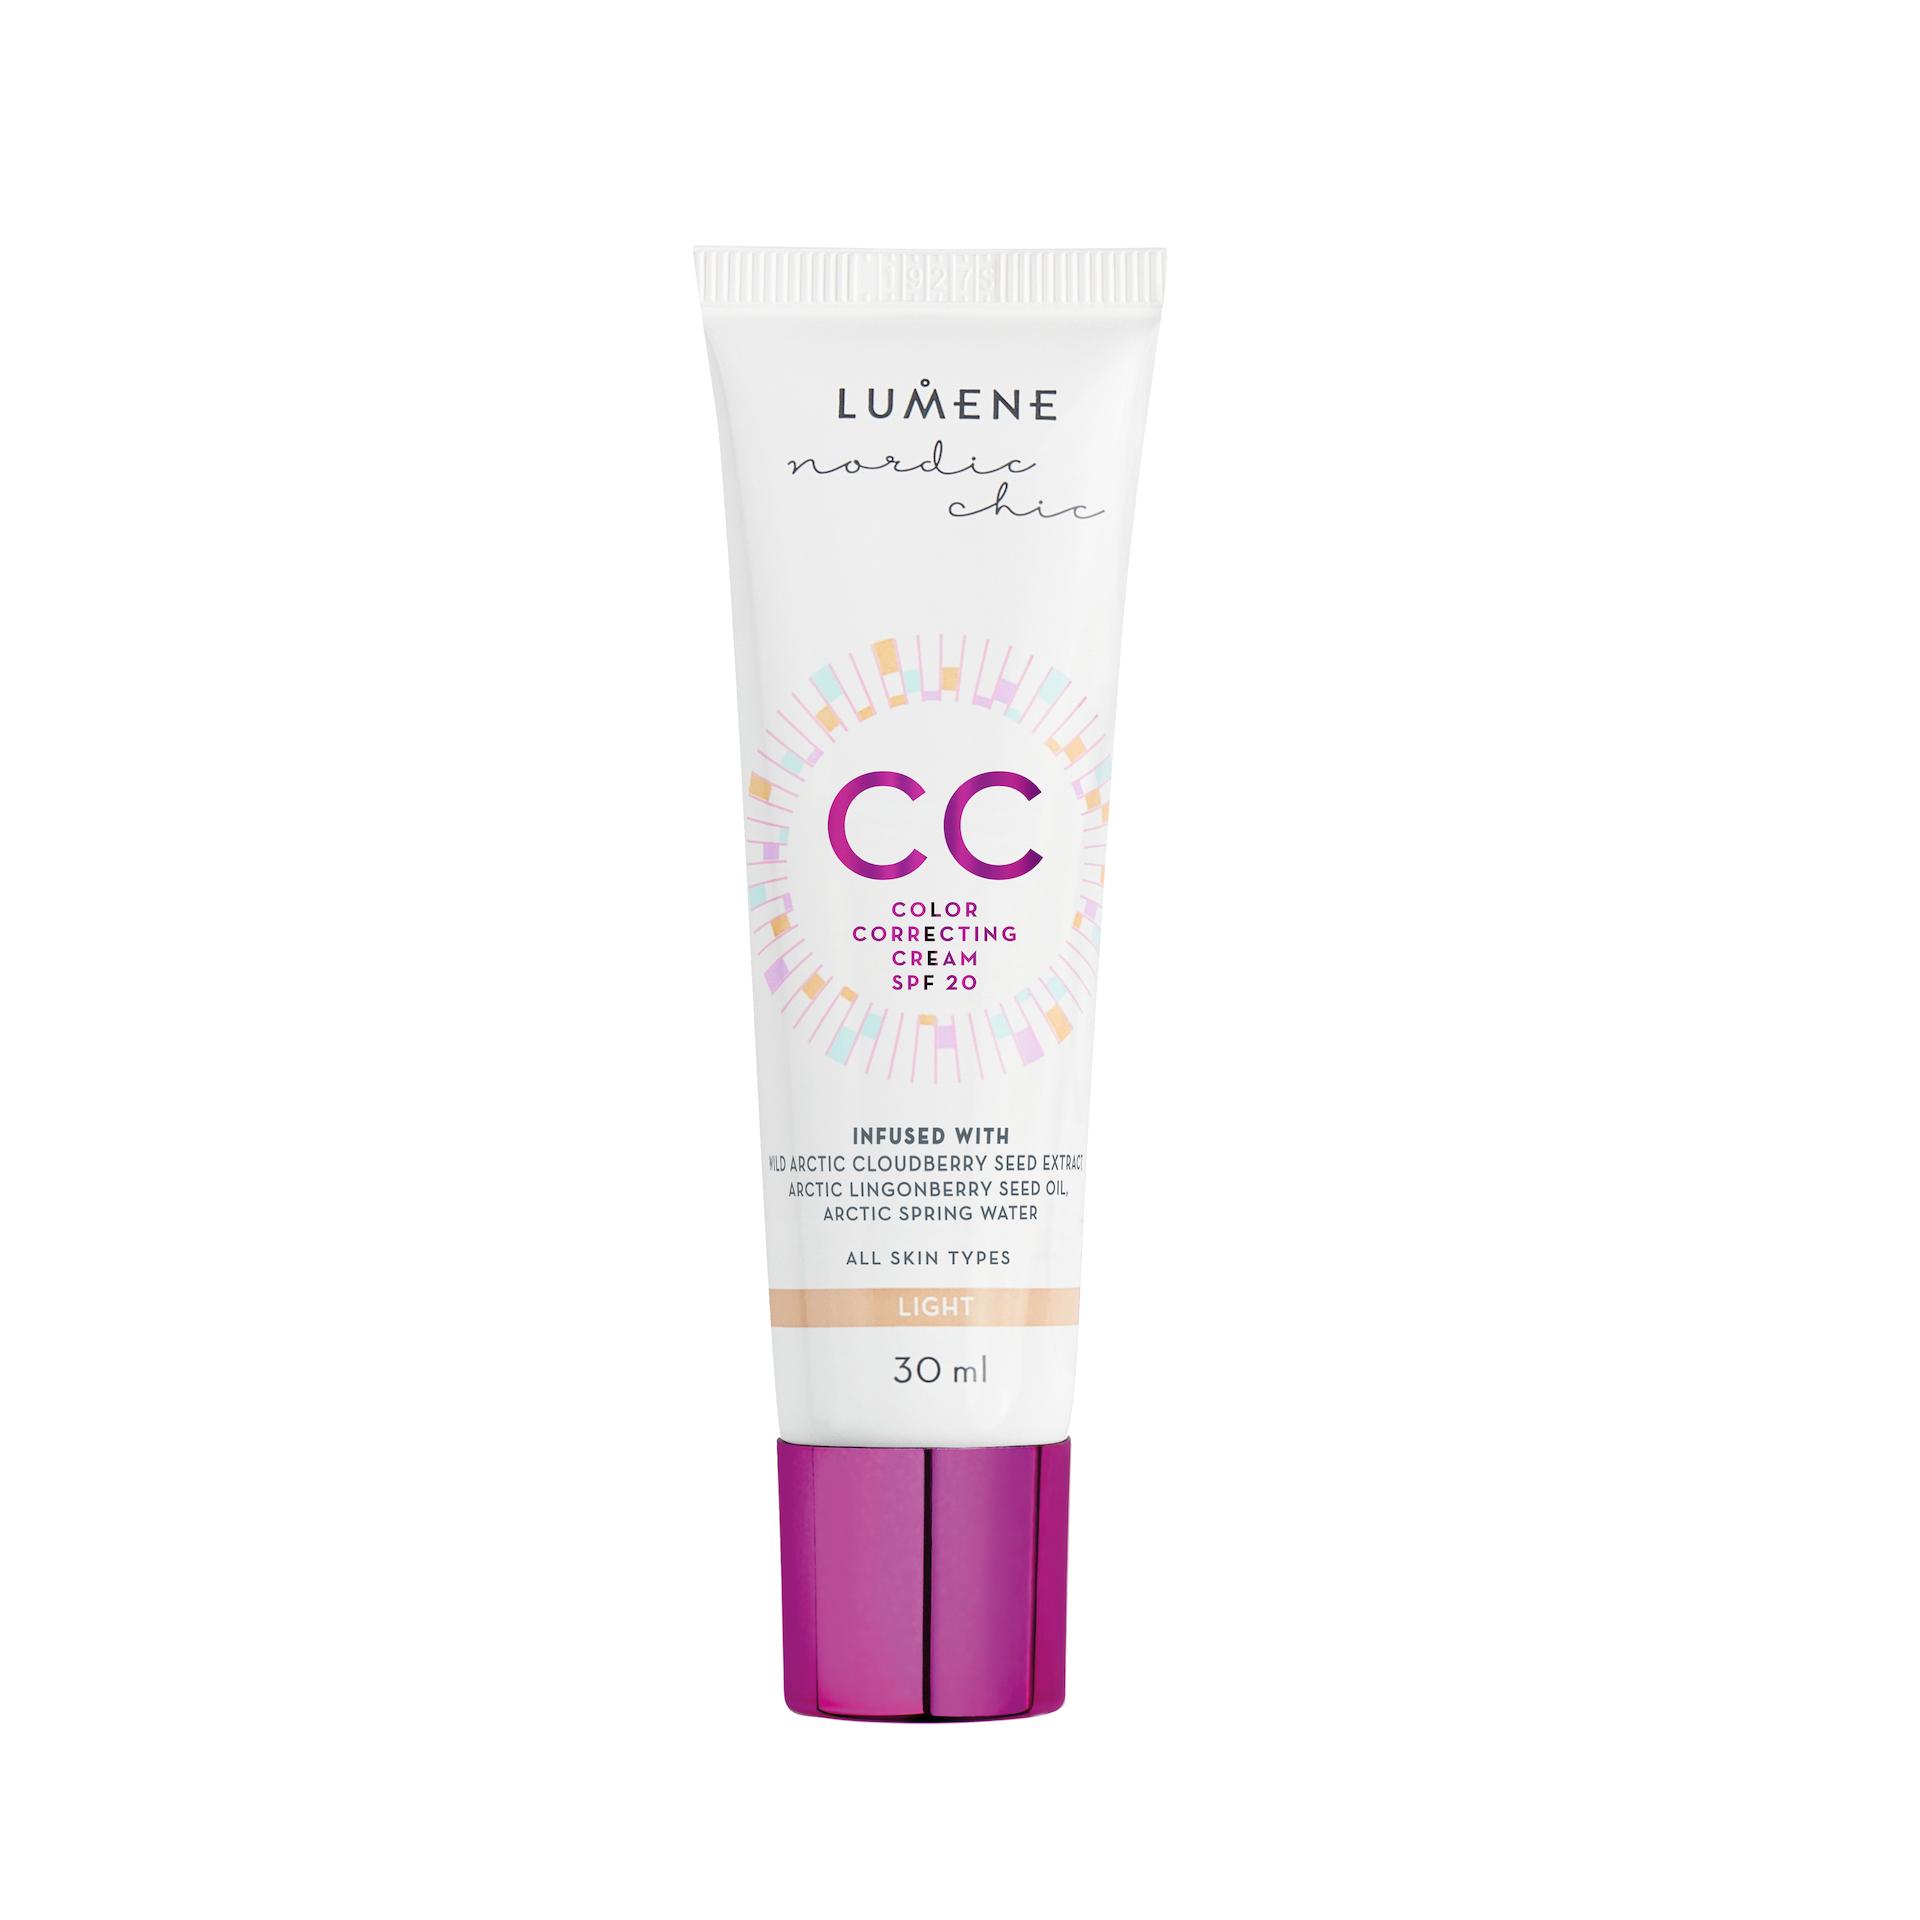 Nordic Chic CC Color Correcting Cream Light